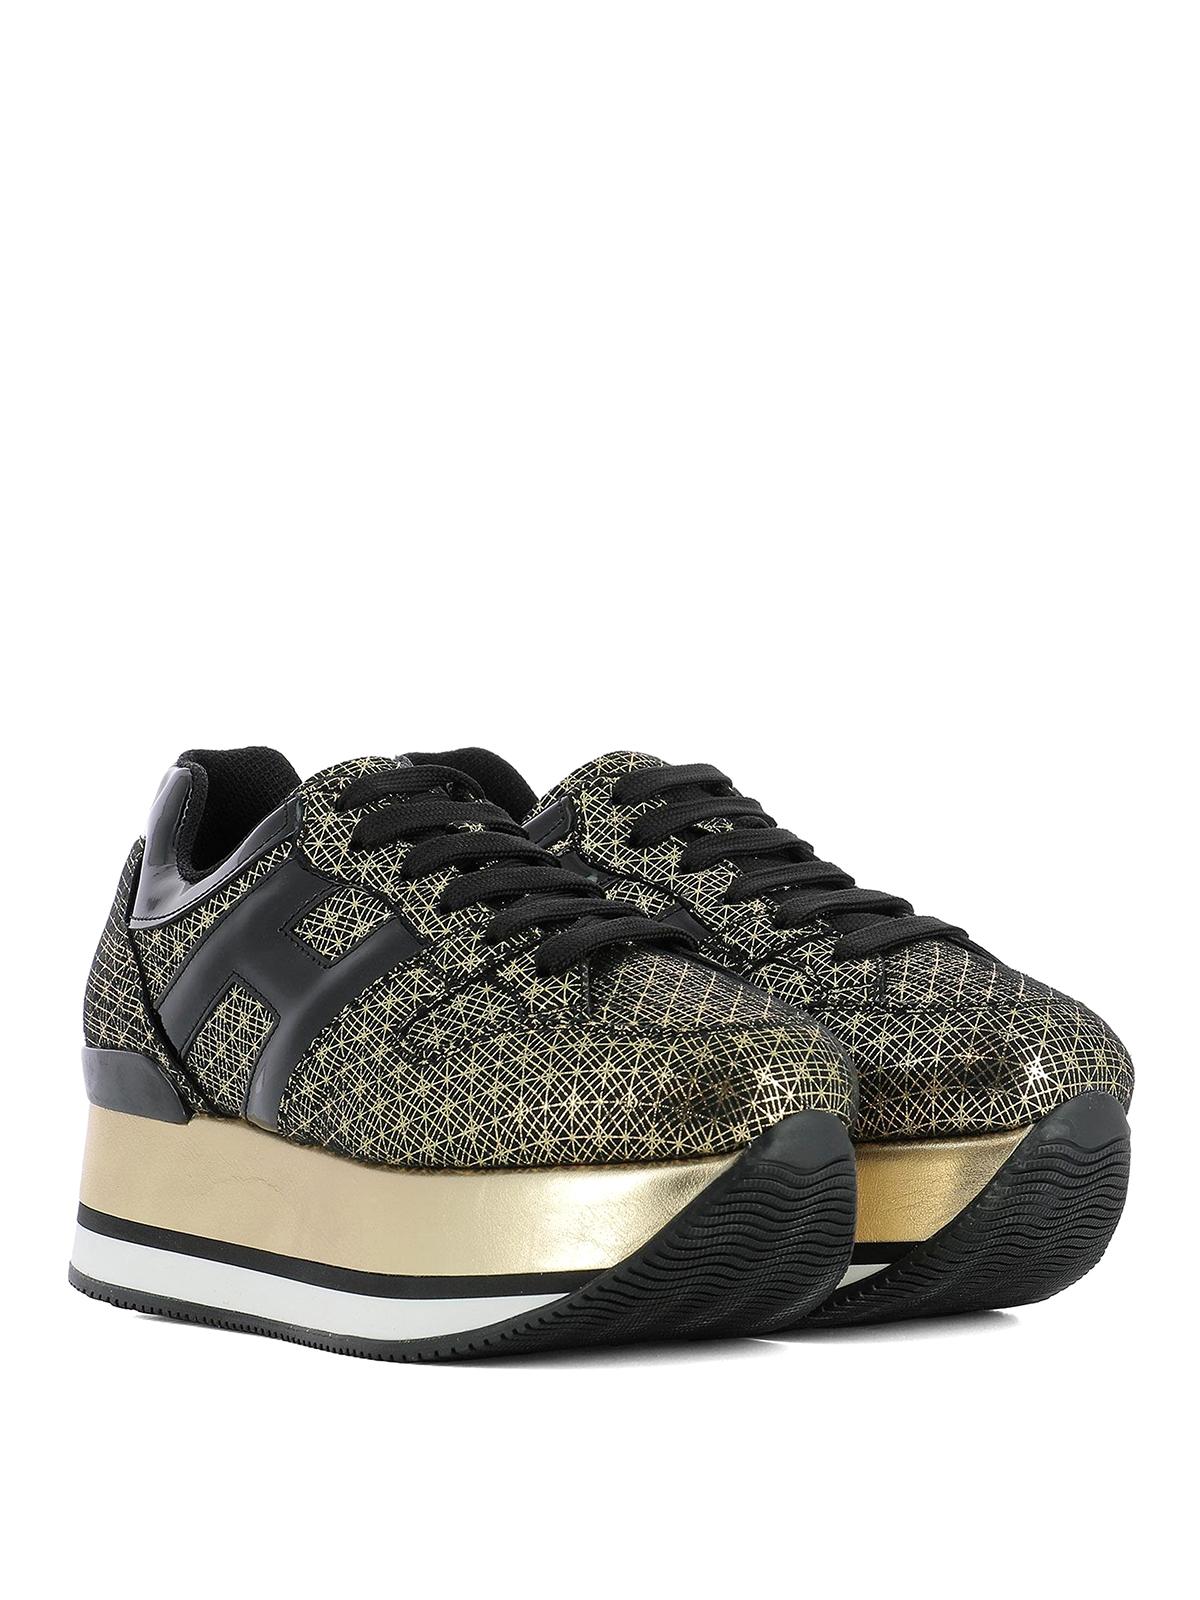 Maxi H222 gold geometric sneakers